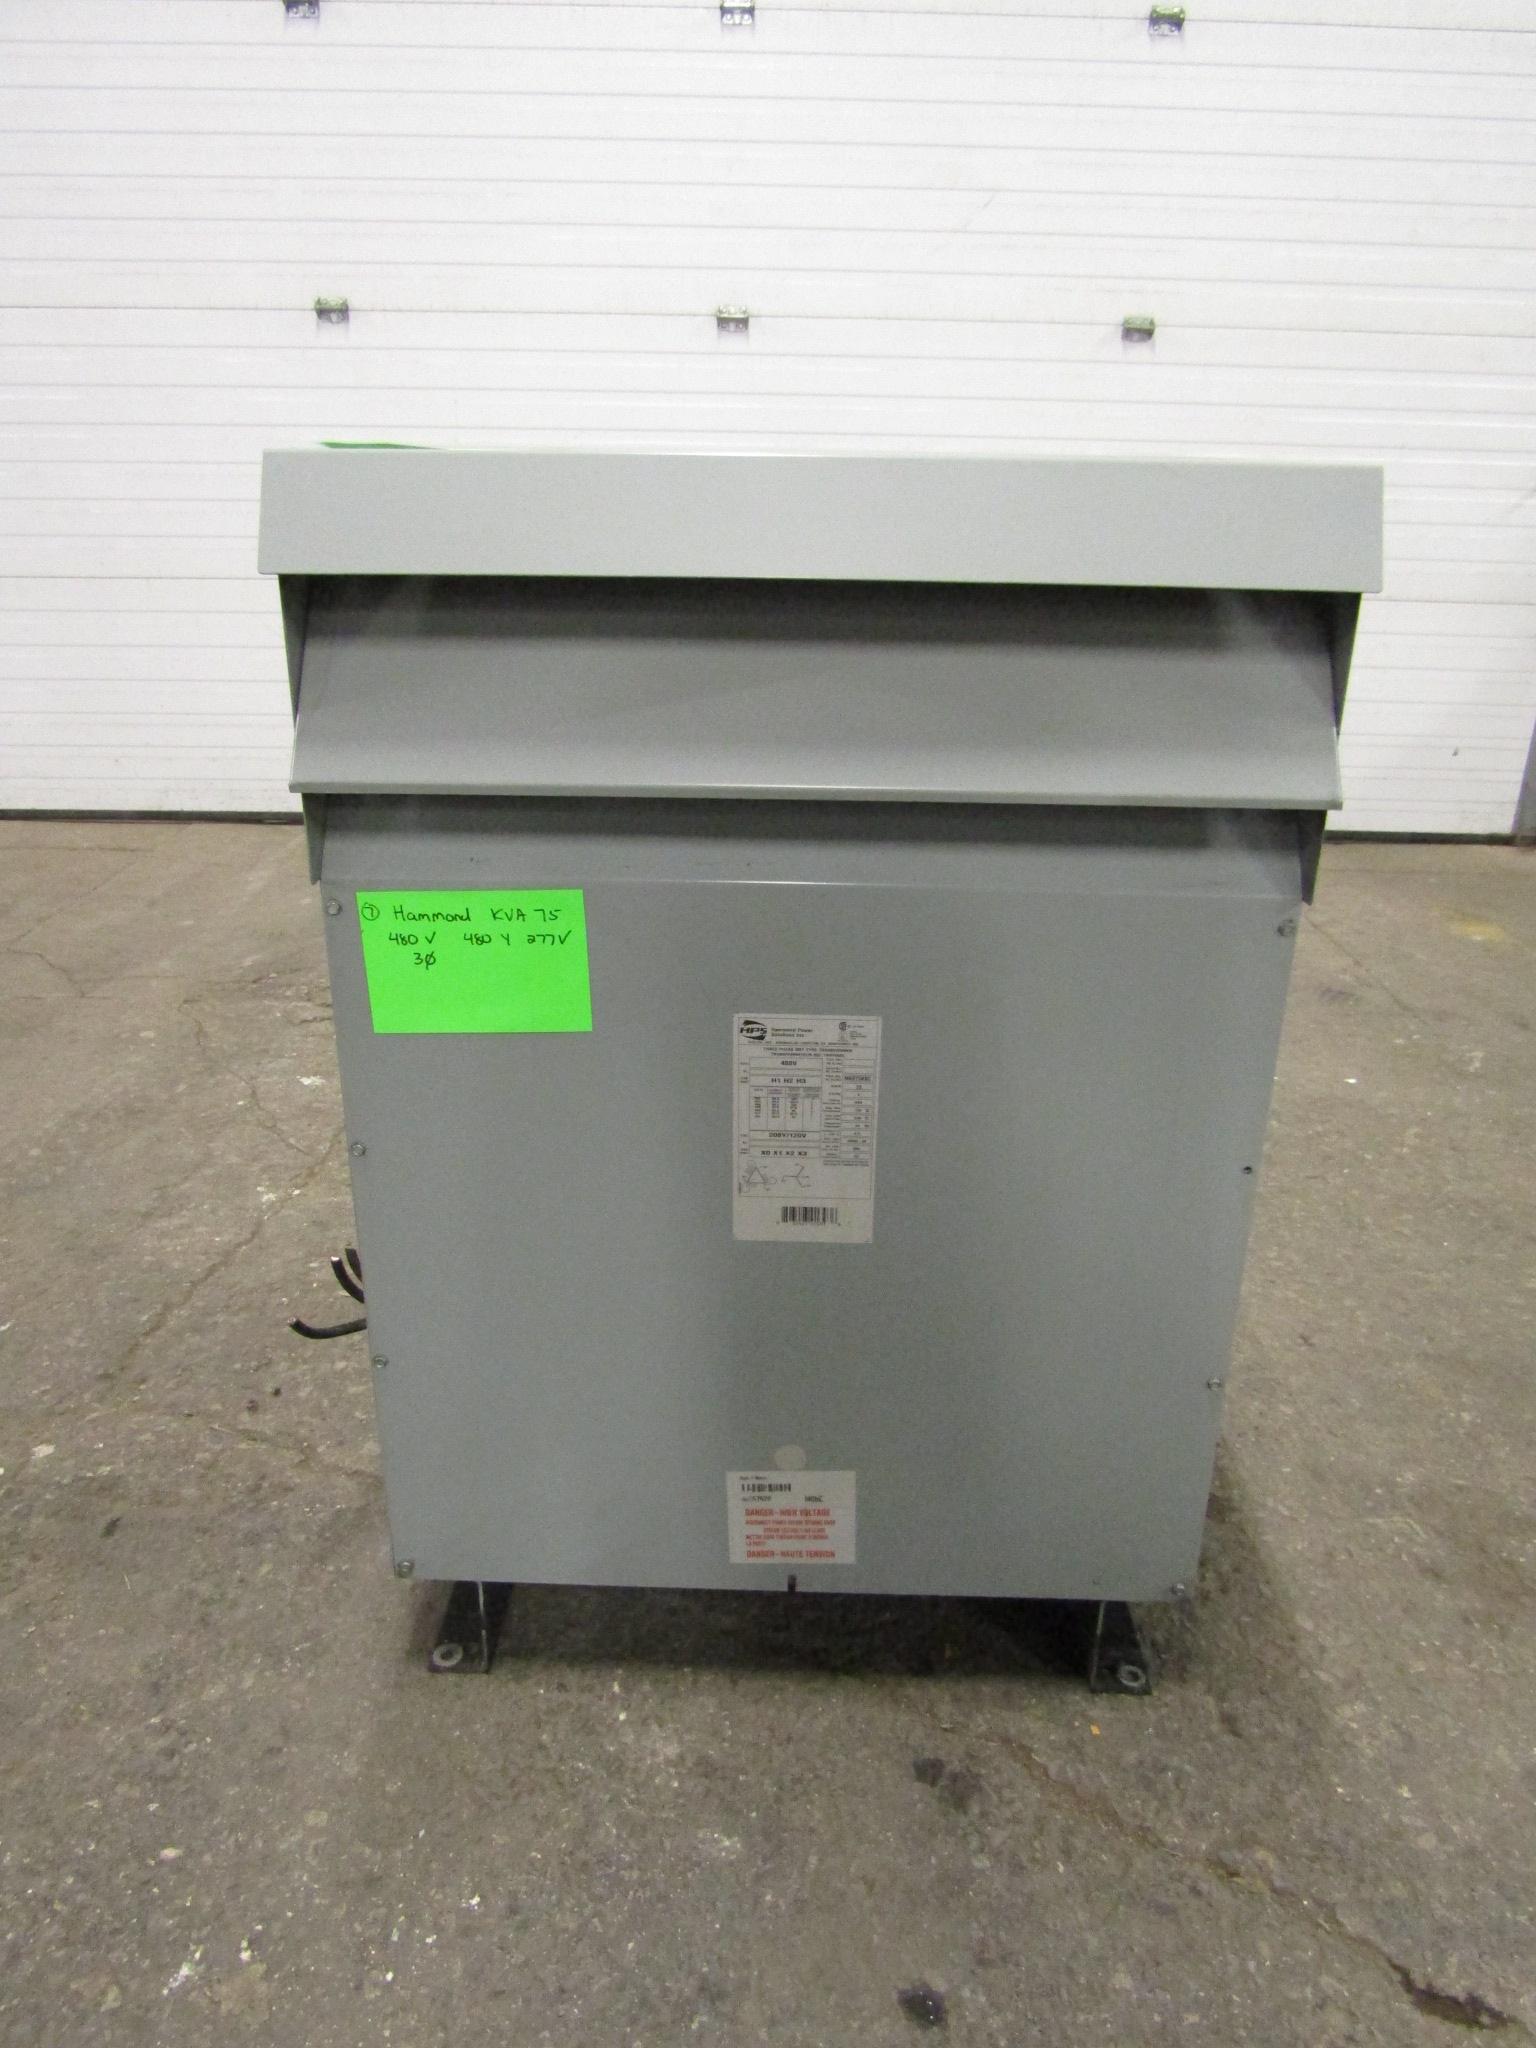 Lot 30 - Hammond 75 KVA Electrical Transformer - 480V to 480Y / 277V 3 phase